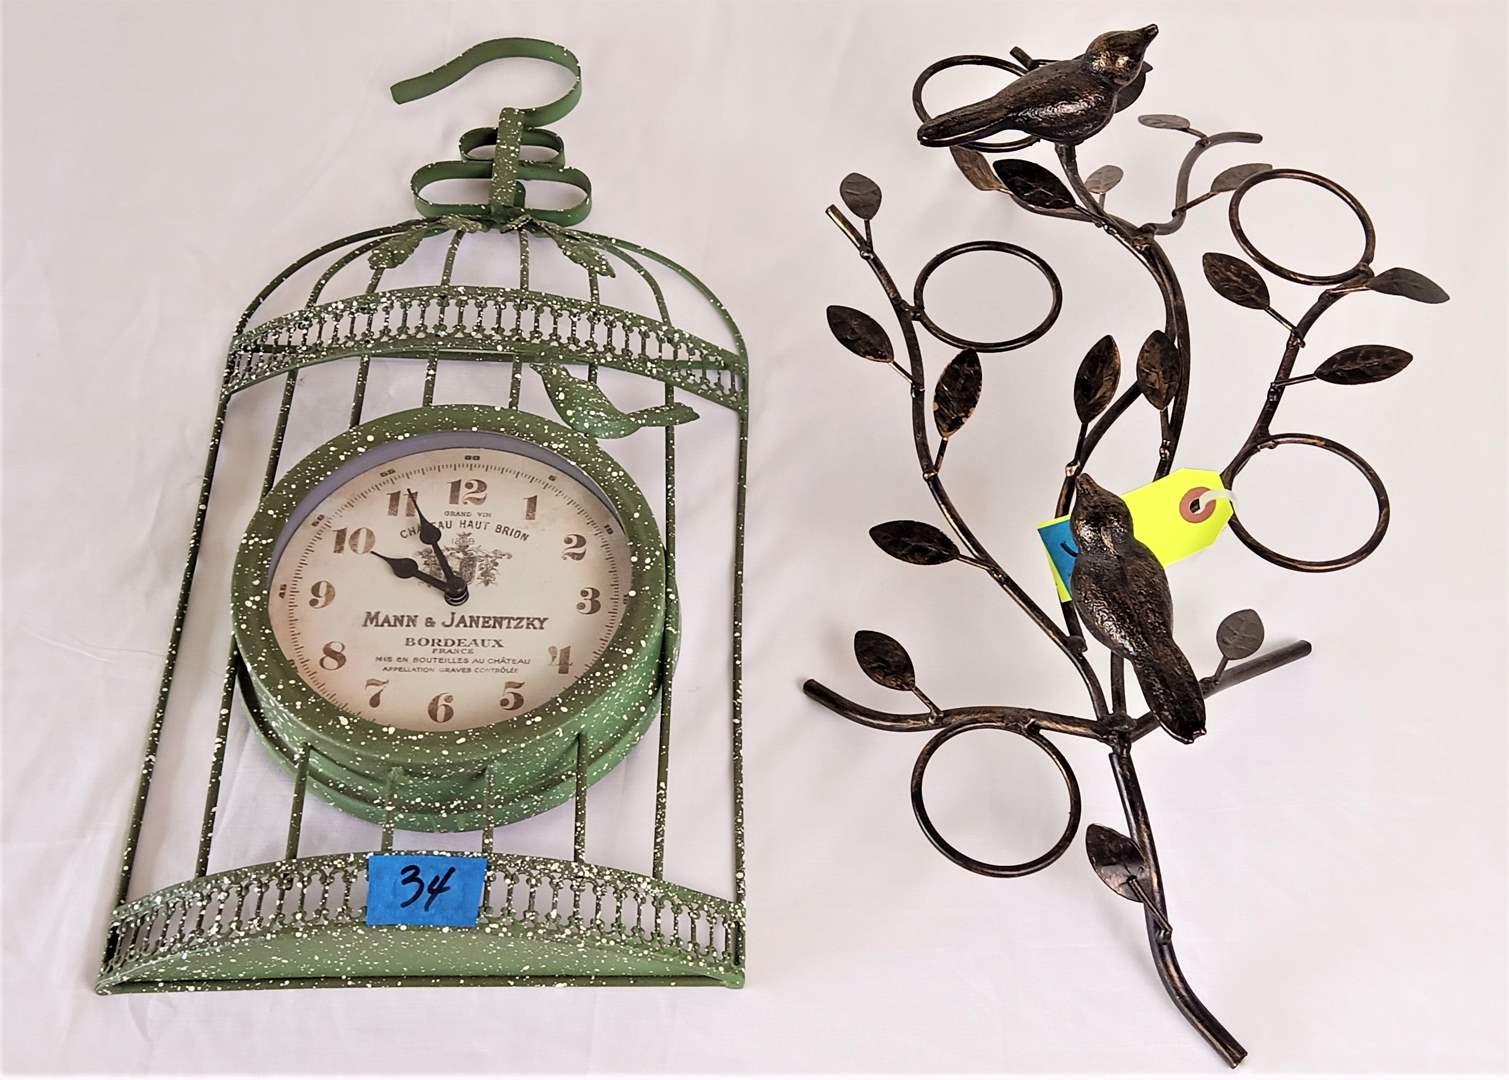 Lot # 34 Decorative Bird Cage Wall Clock & Metal Bird Decor Candle Holder